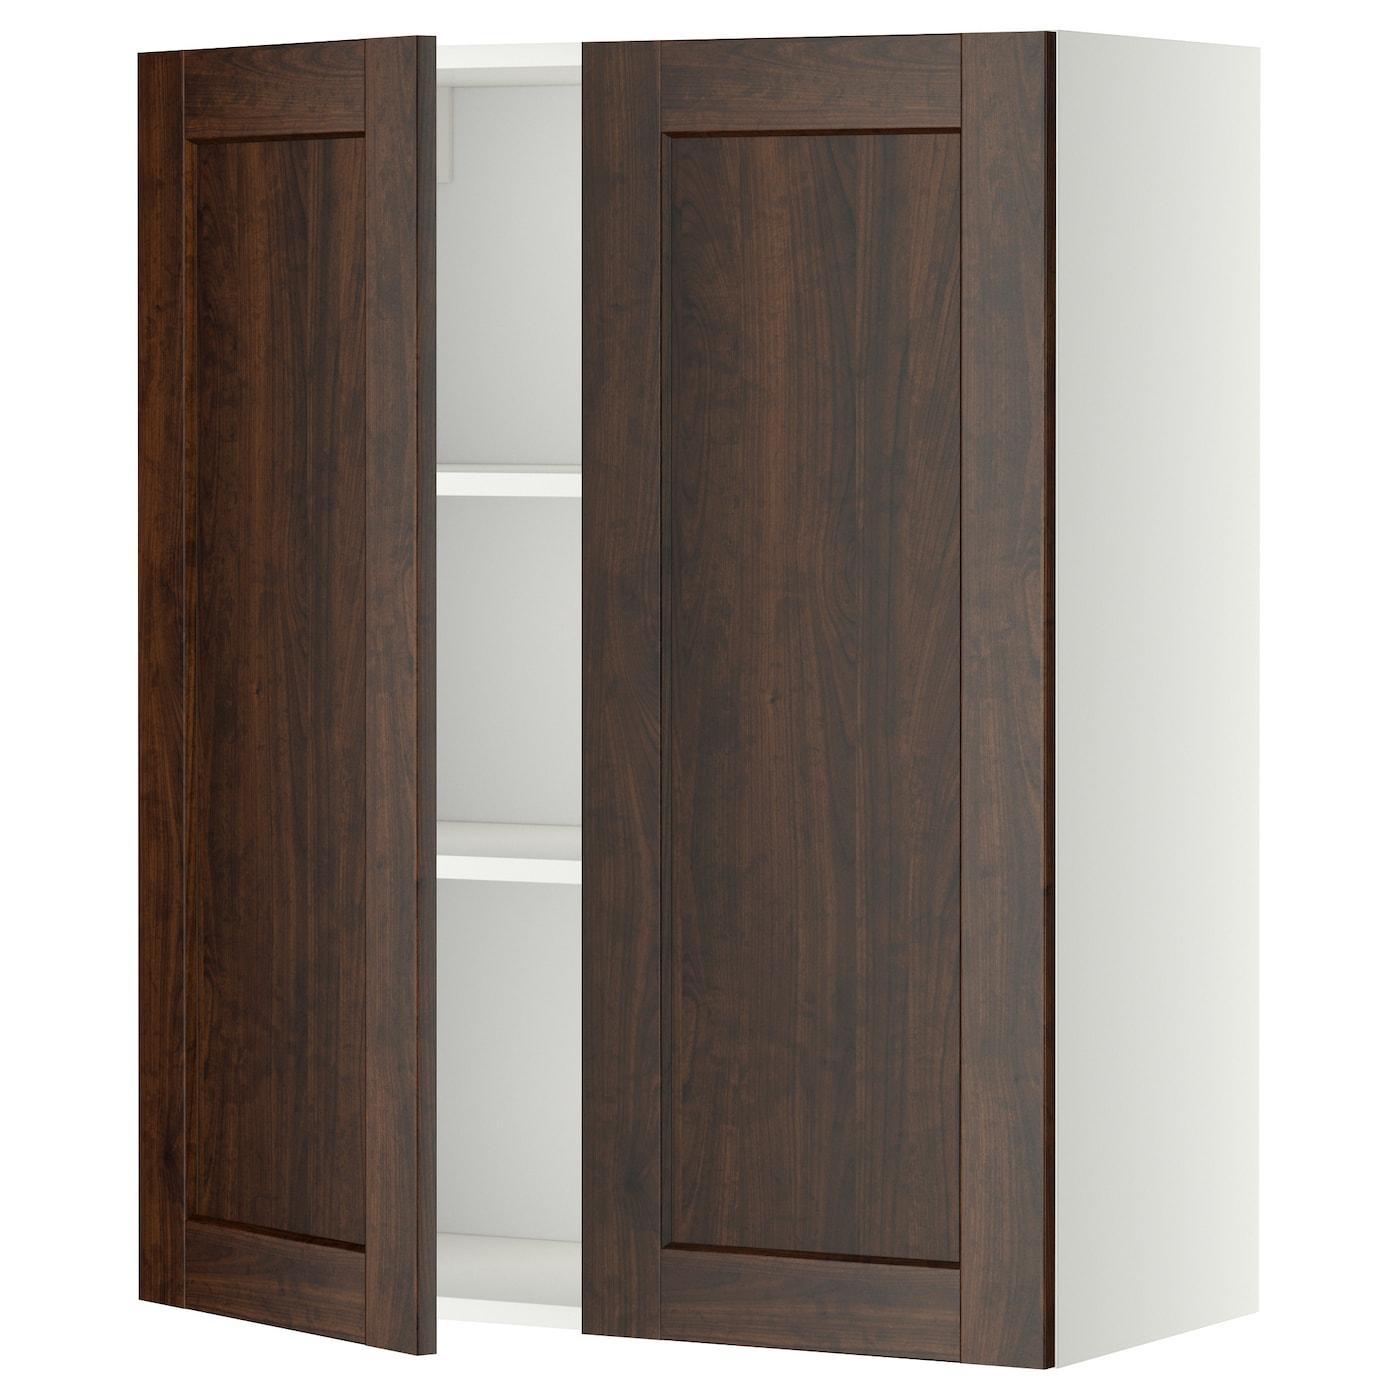 fresh ikea kitchen cabinet doors interior design